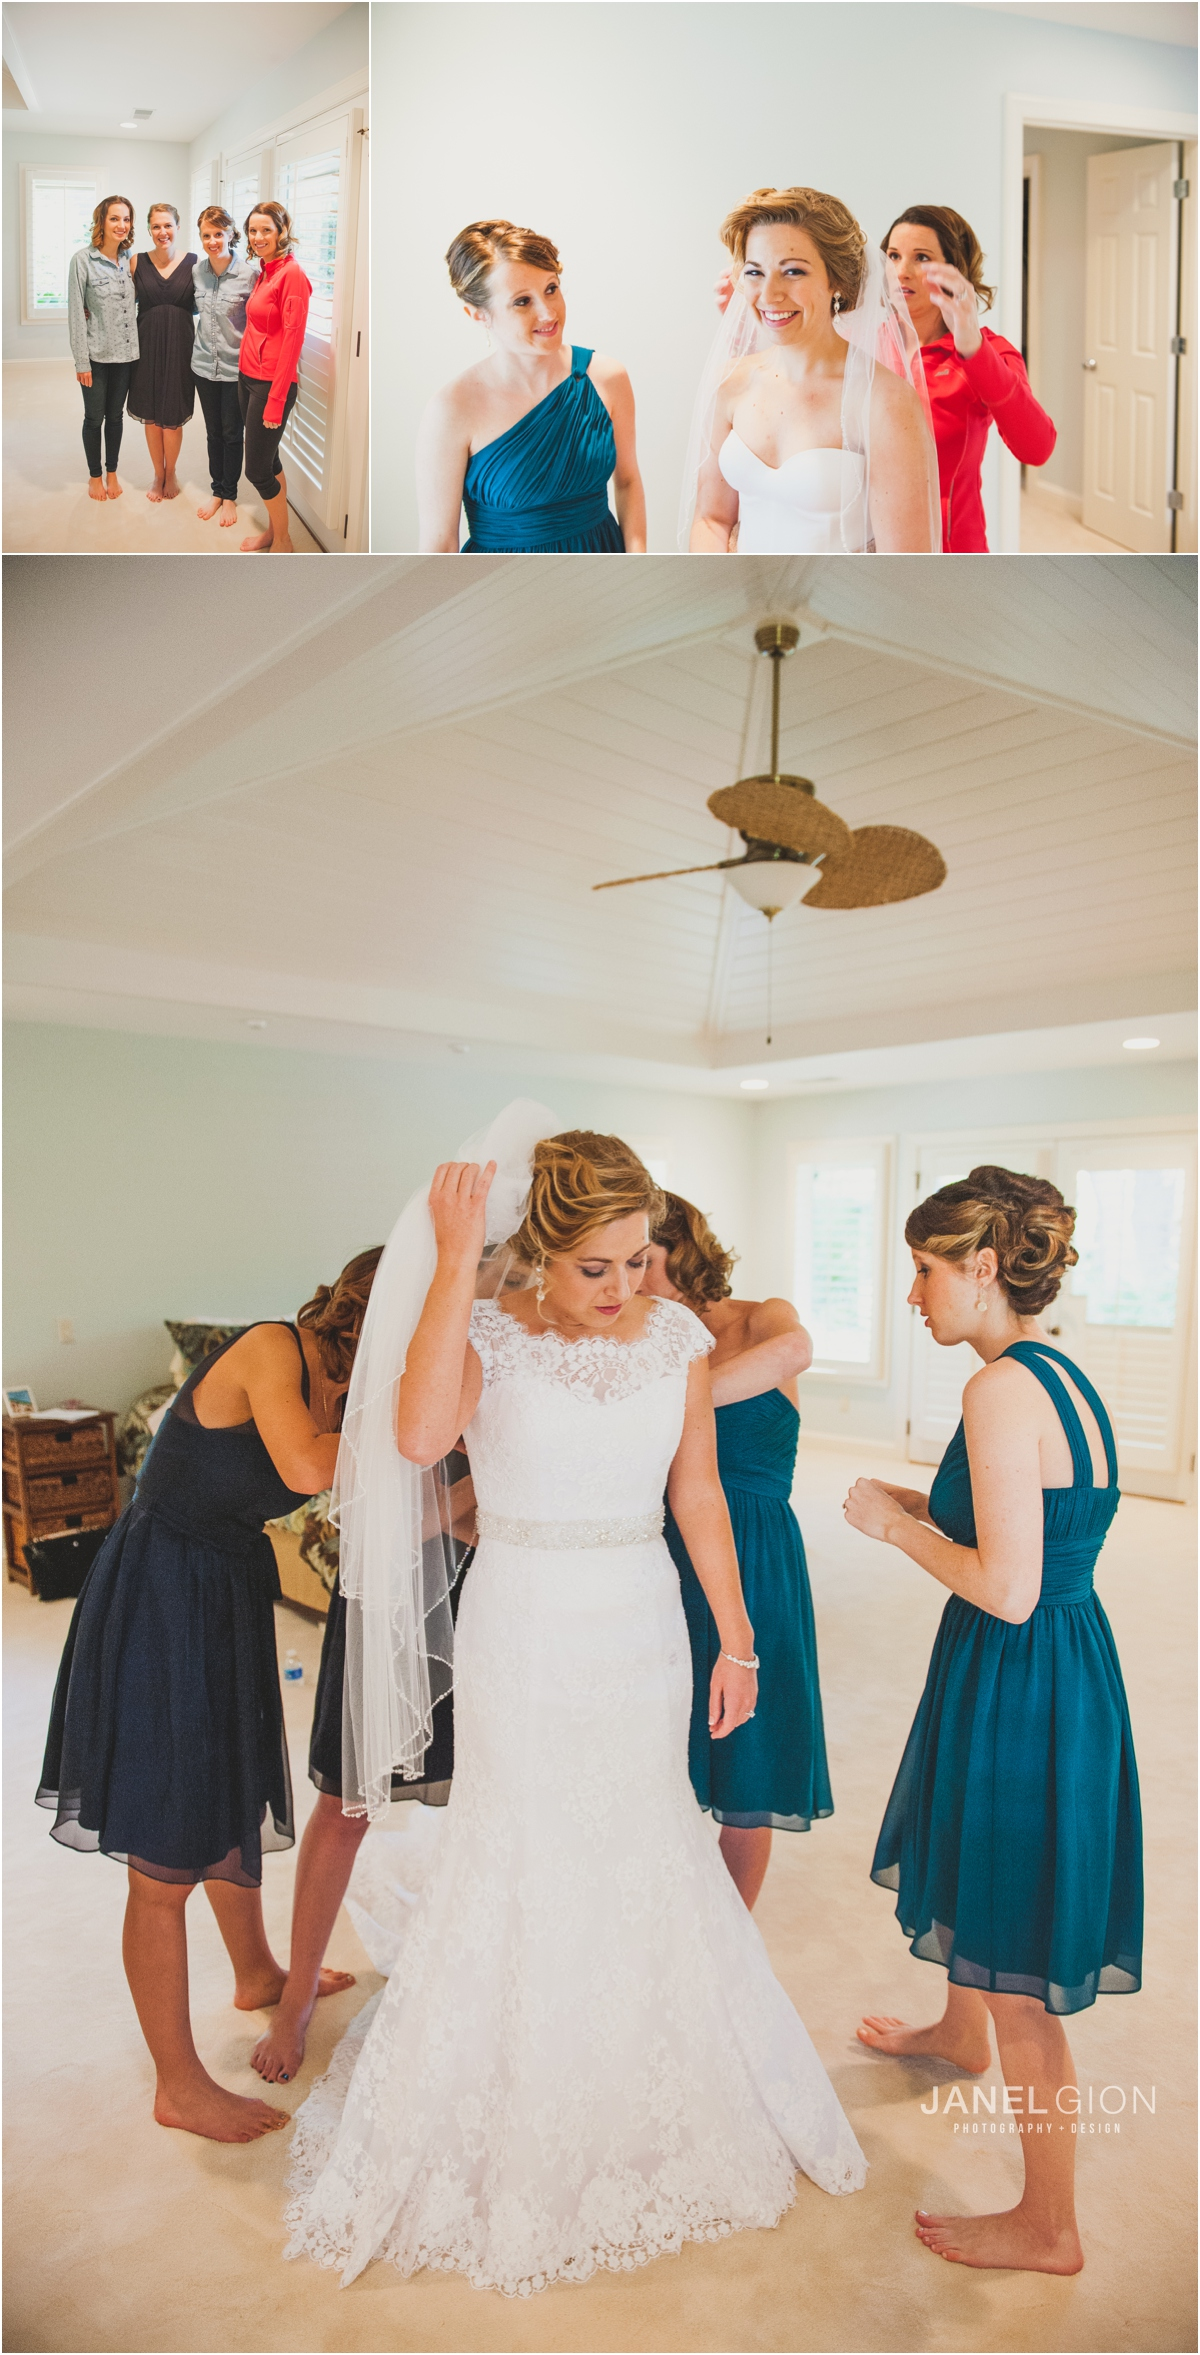 Janel-Gion-Hilton-Head-Island-SC-Destination-Wedding-Photographer_0007